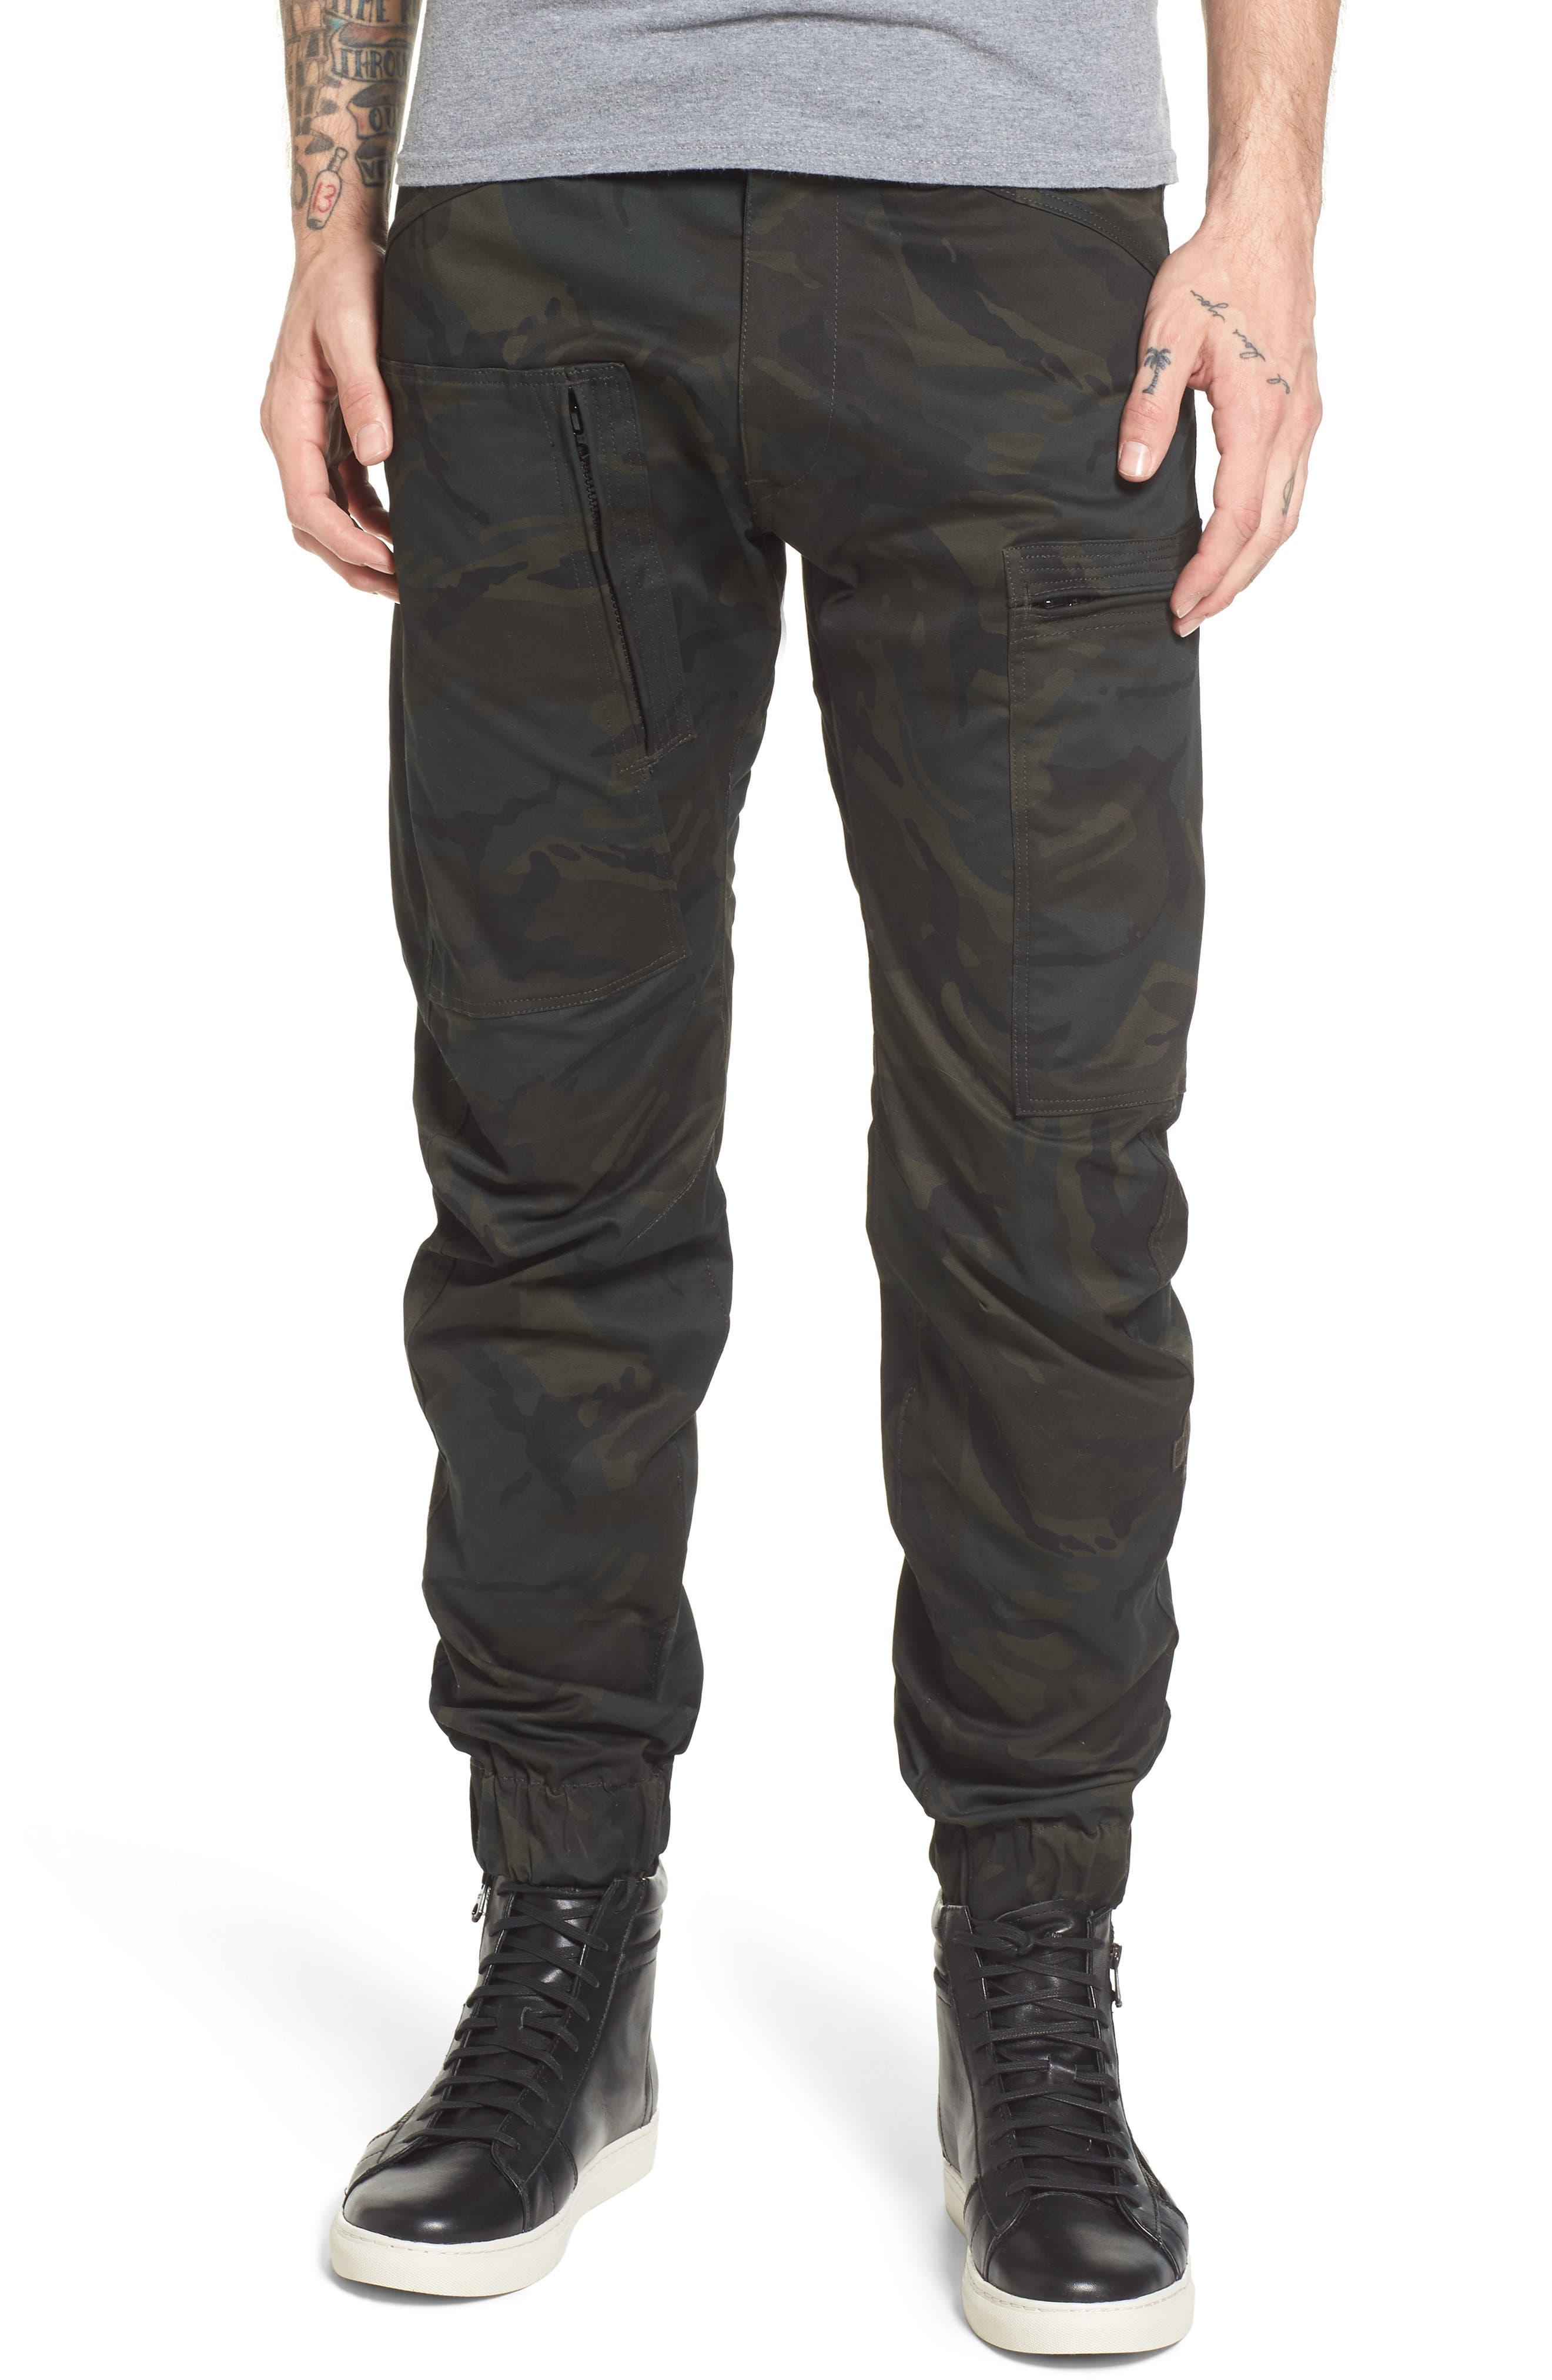 Powel 3D Tapered Jogger Pants,                             Main thumbnail 1, color,                             020